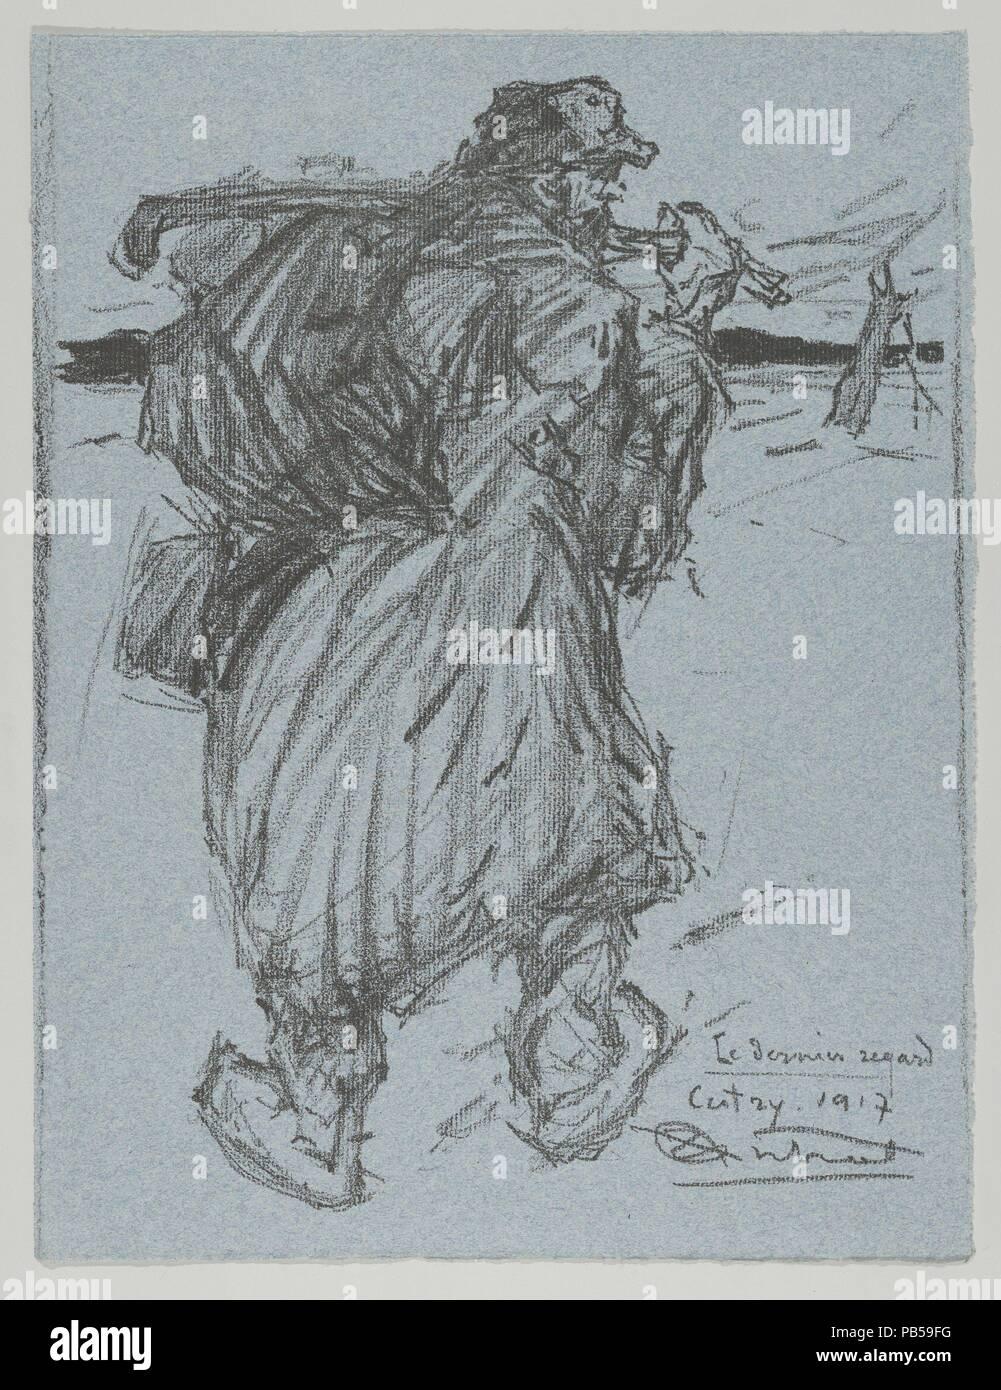 Le Dernier Regard From Les Evacus Artist Louis Robert Antral French Chlon Sur Marne 1895 1939 Paris Dimensions Sheet 12 3 8 X 9 In